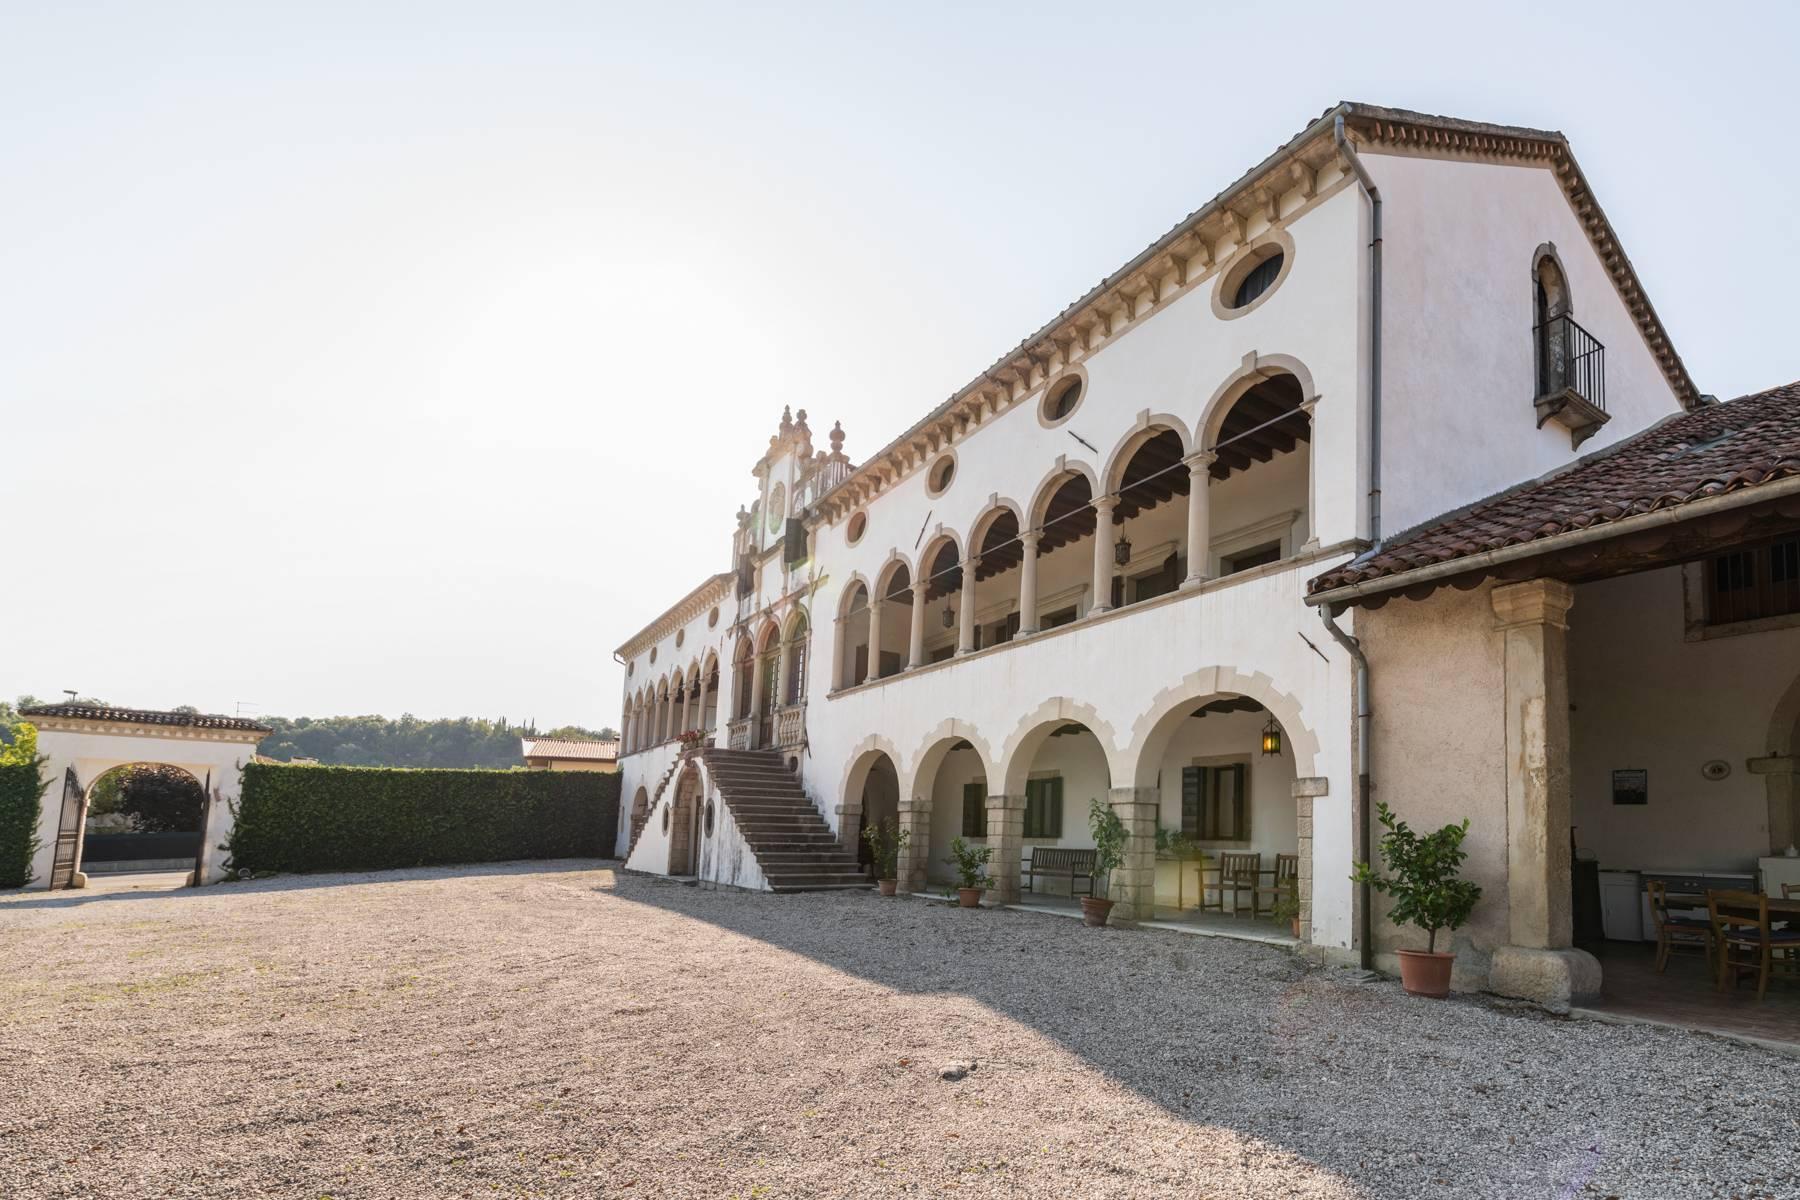 Elegant 17th century Venetian Villa with park on the hills of Treviso - 34